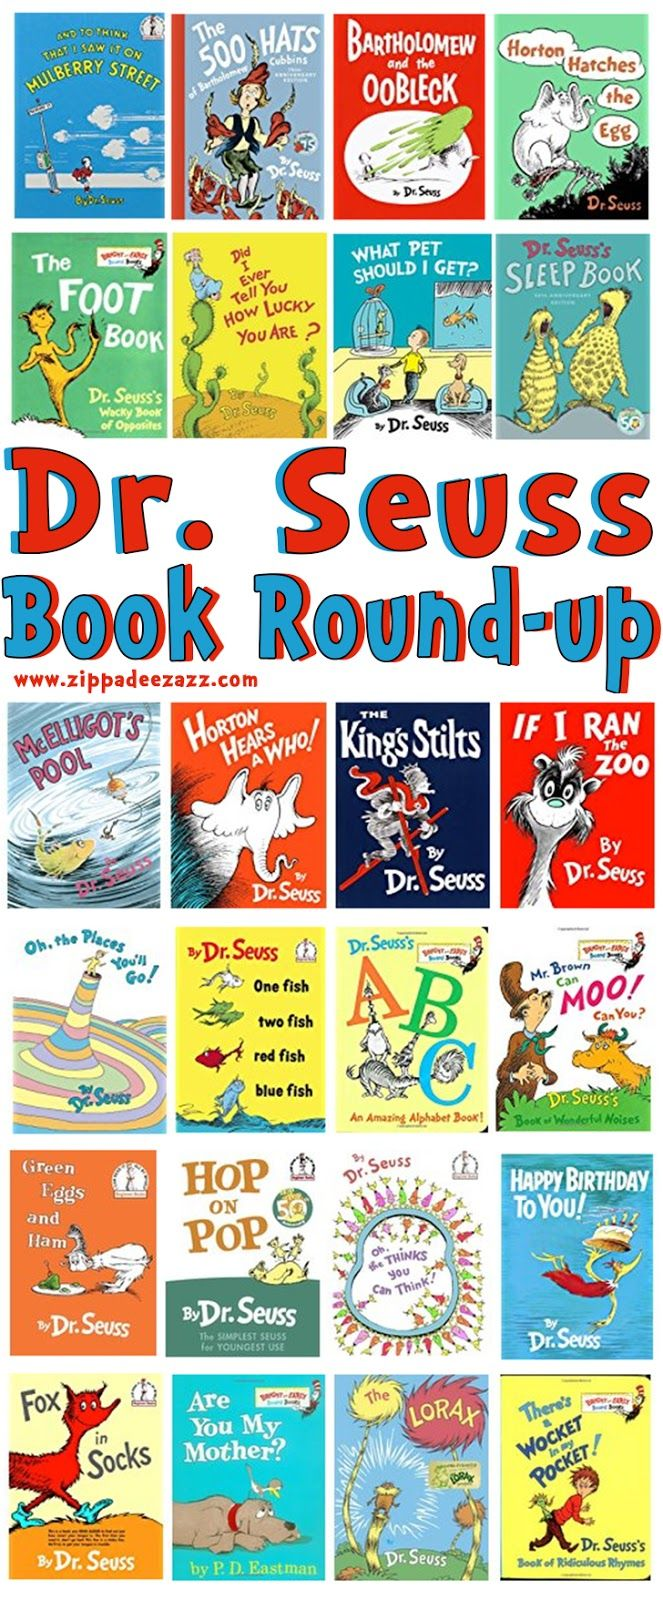 Dr Seuss Book Round-up